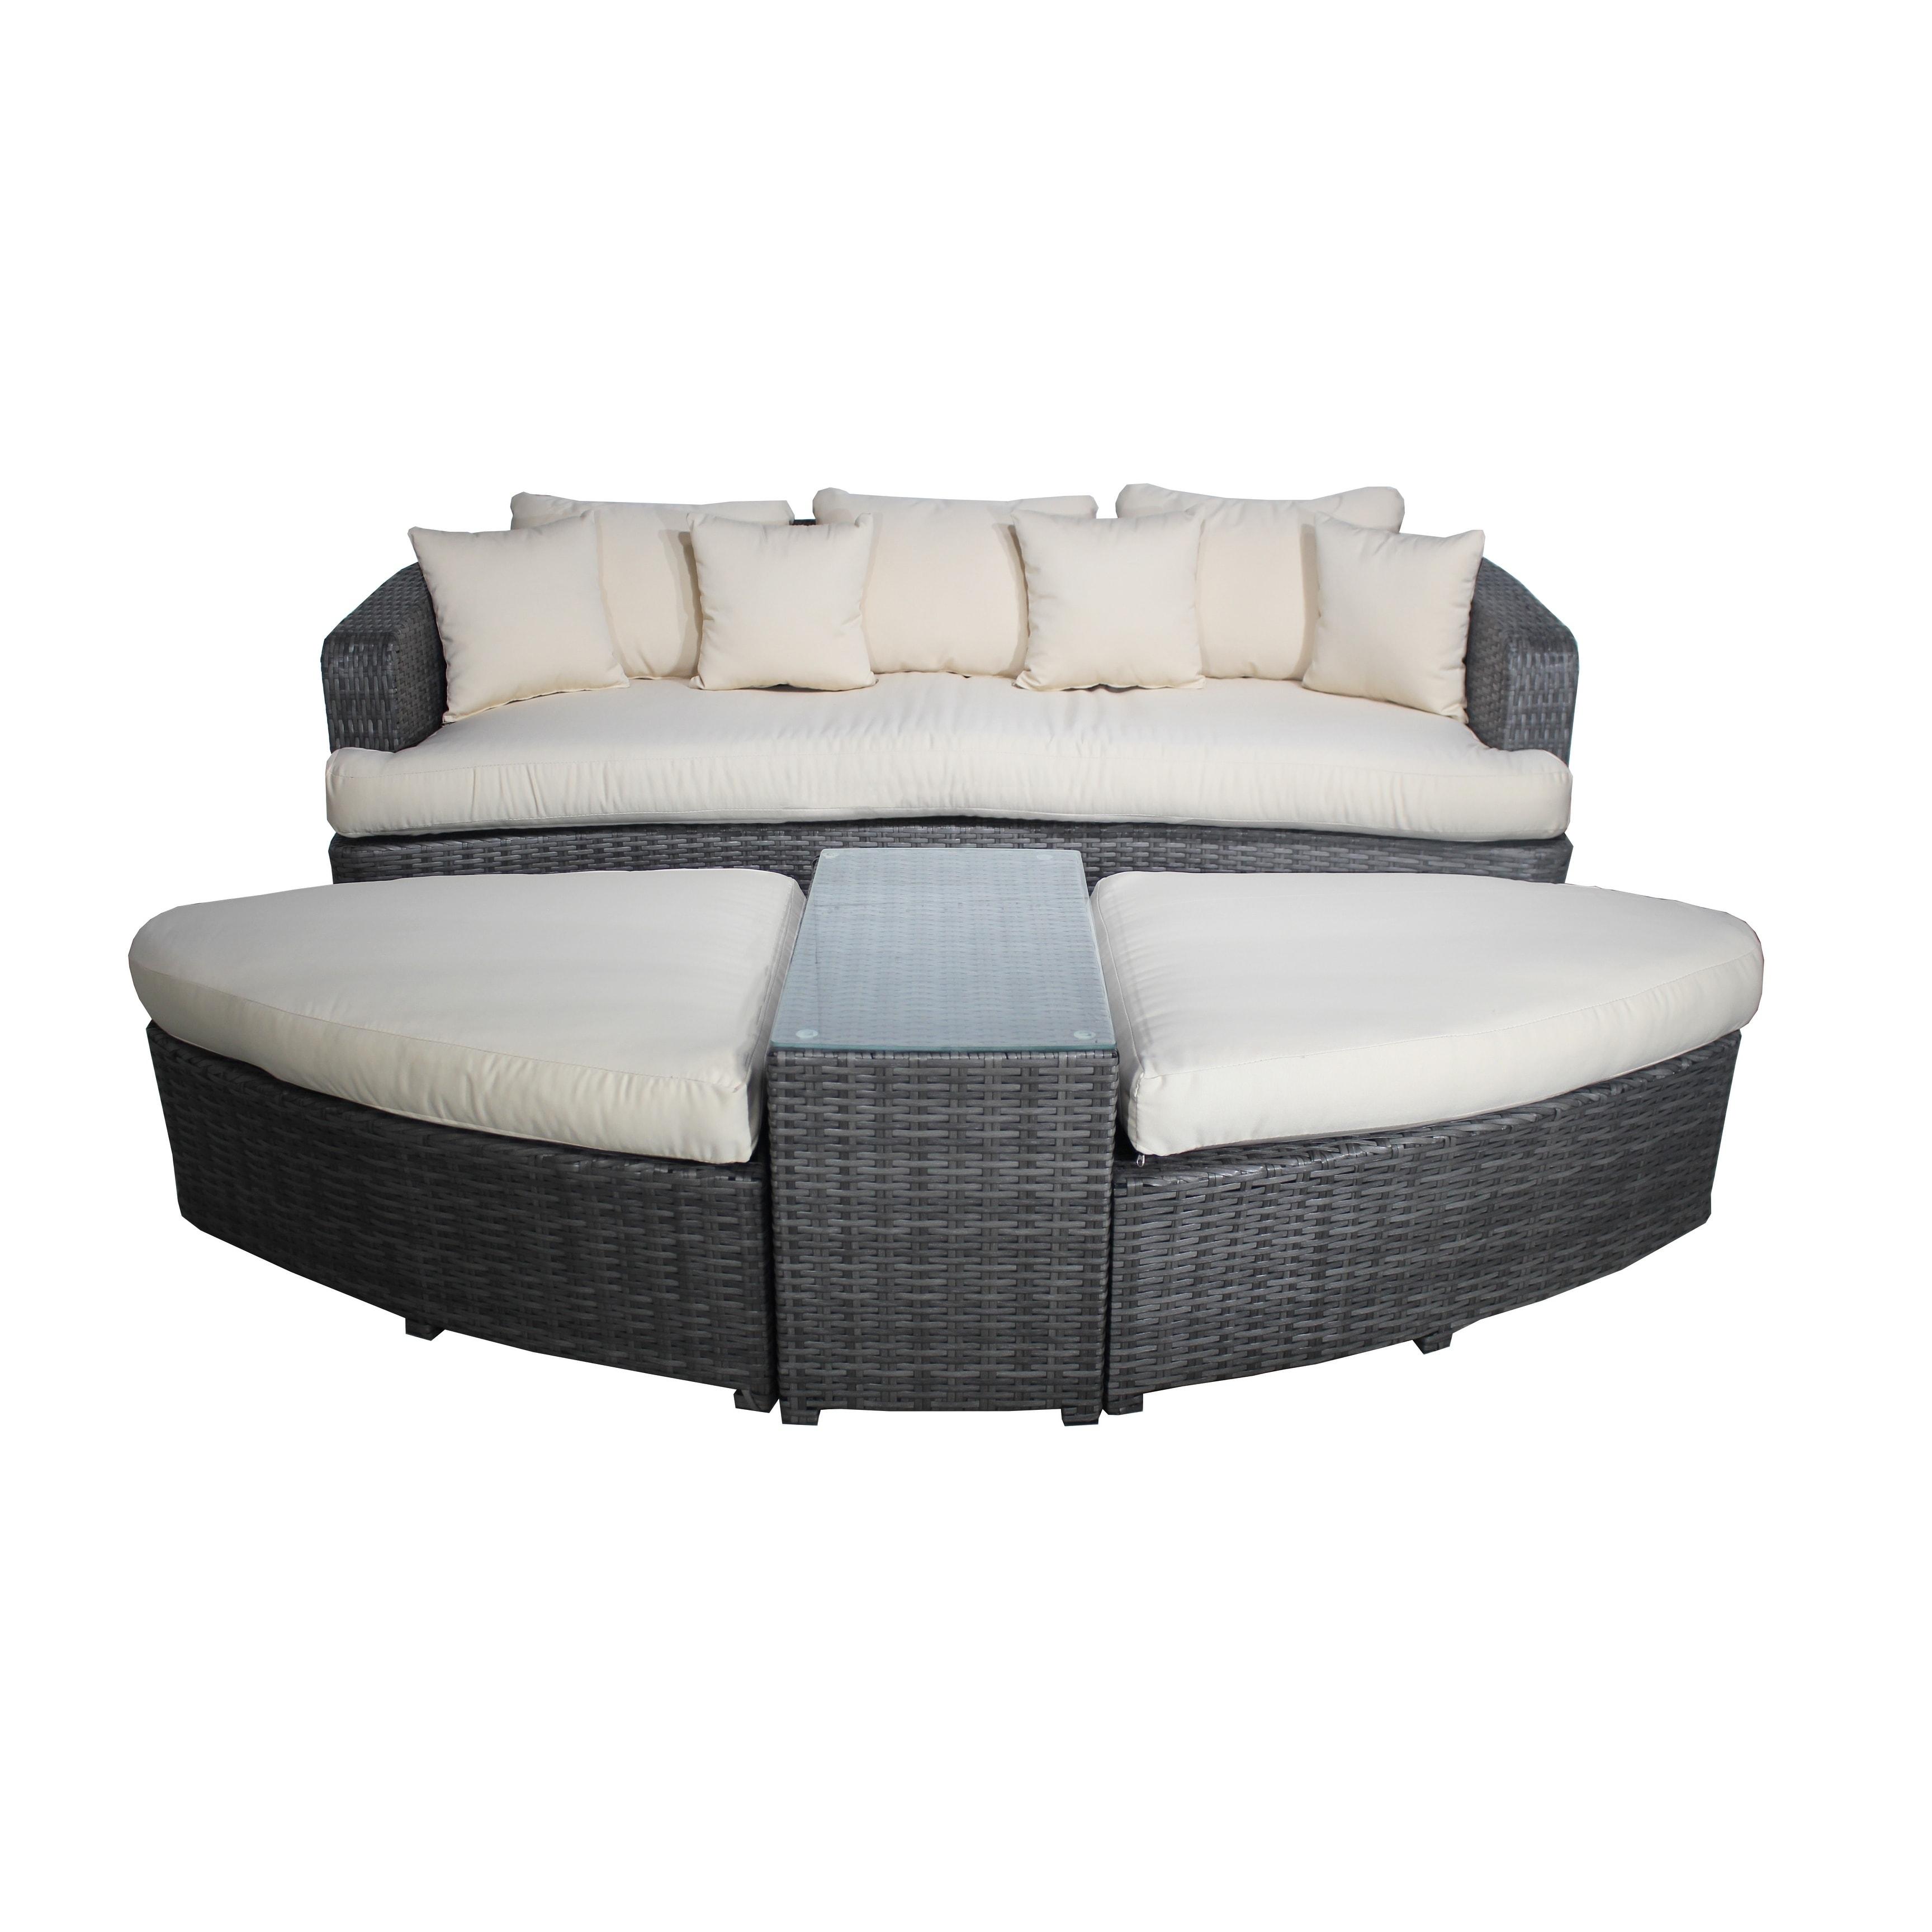 Outdoor Paradise Cove Designs Sarasota Resin Wicker Deep Seating Patio Sofa Set Cream White - 8015105